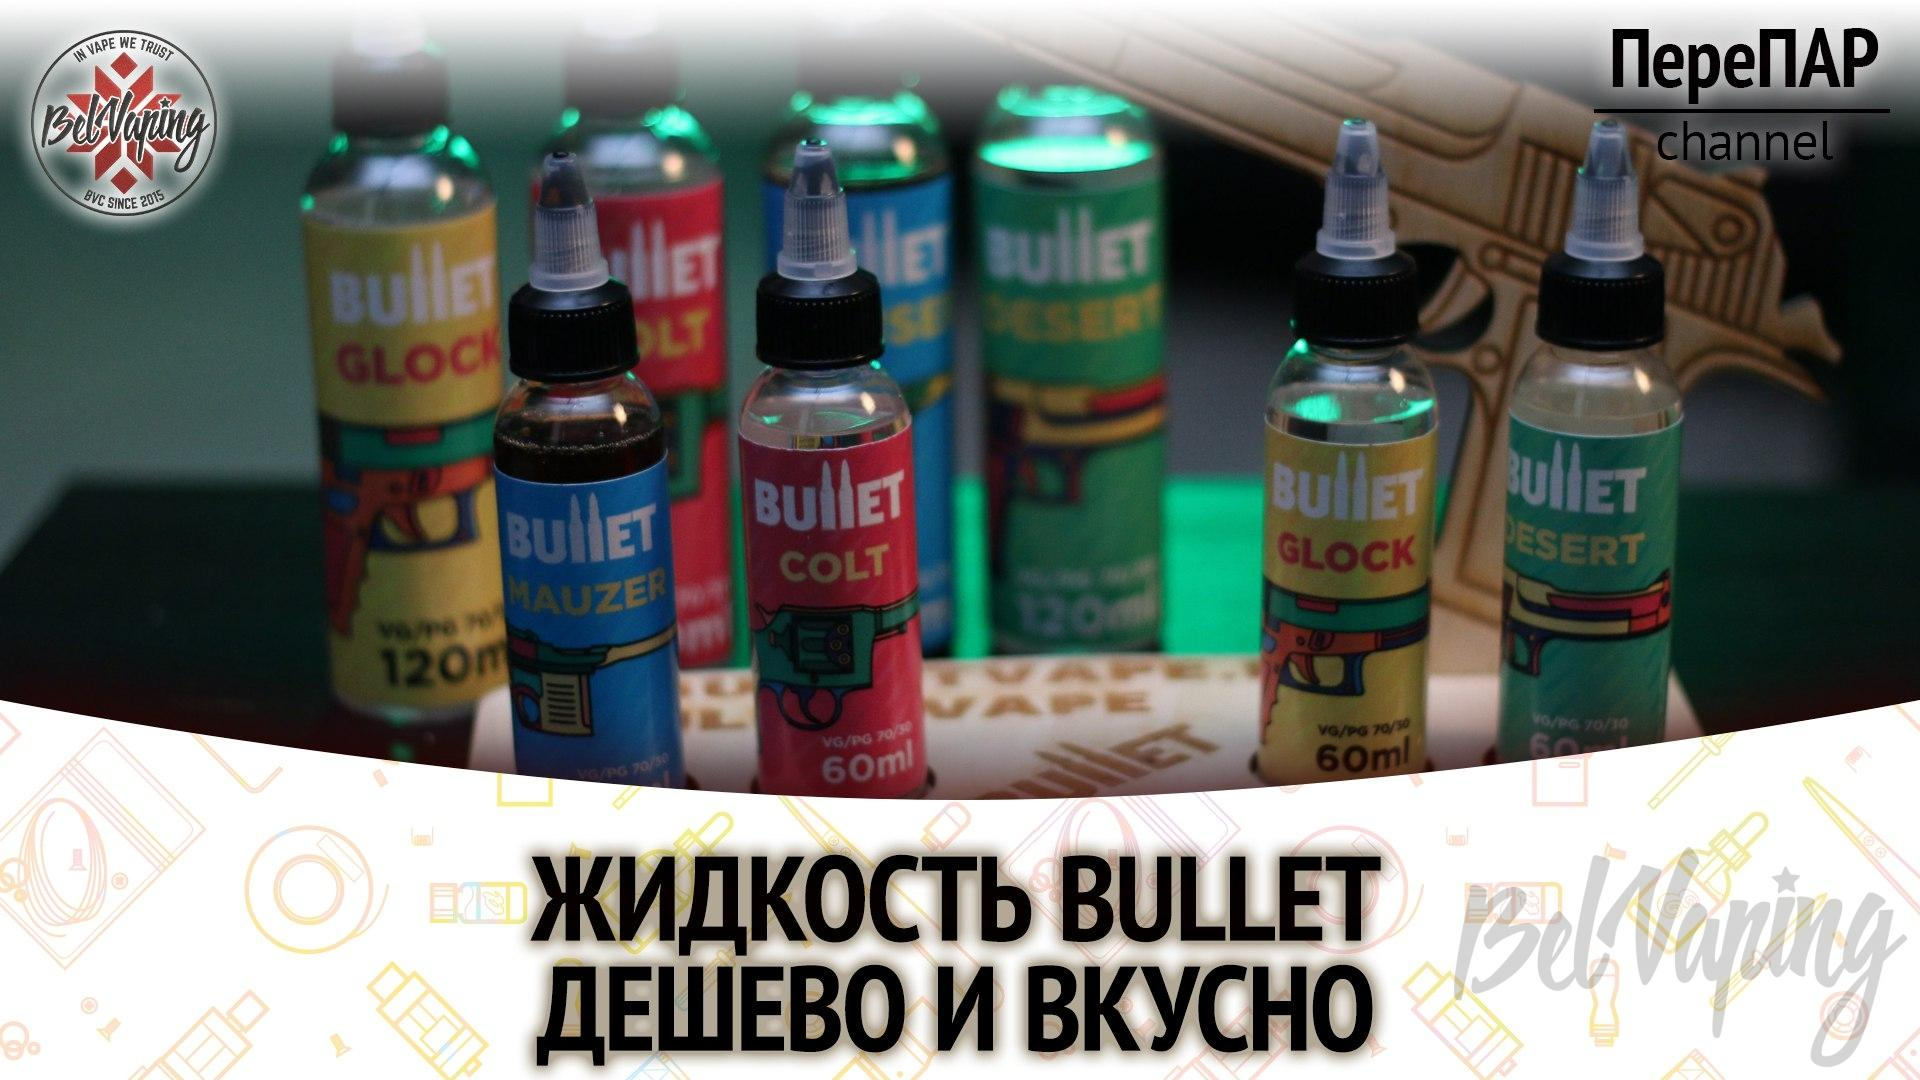 Обзор жидкостей Bullet E-liquid